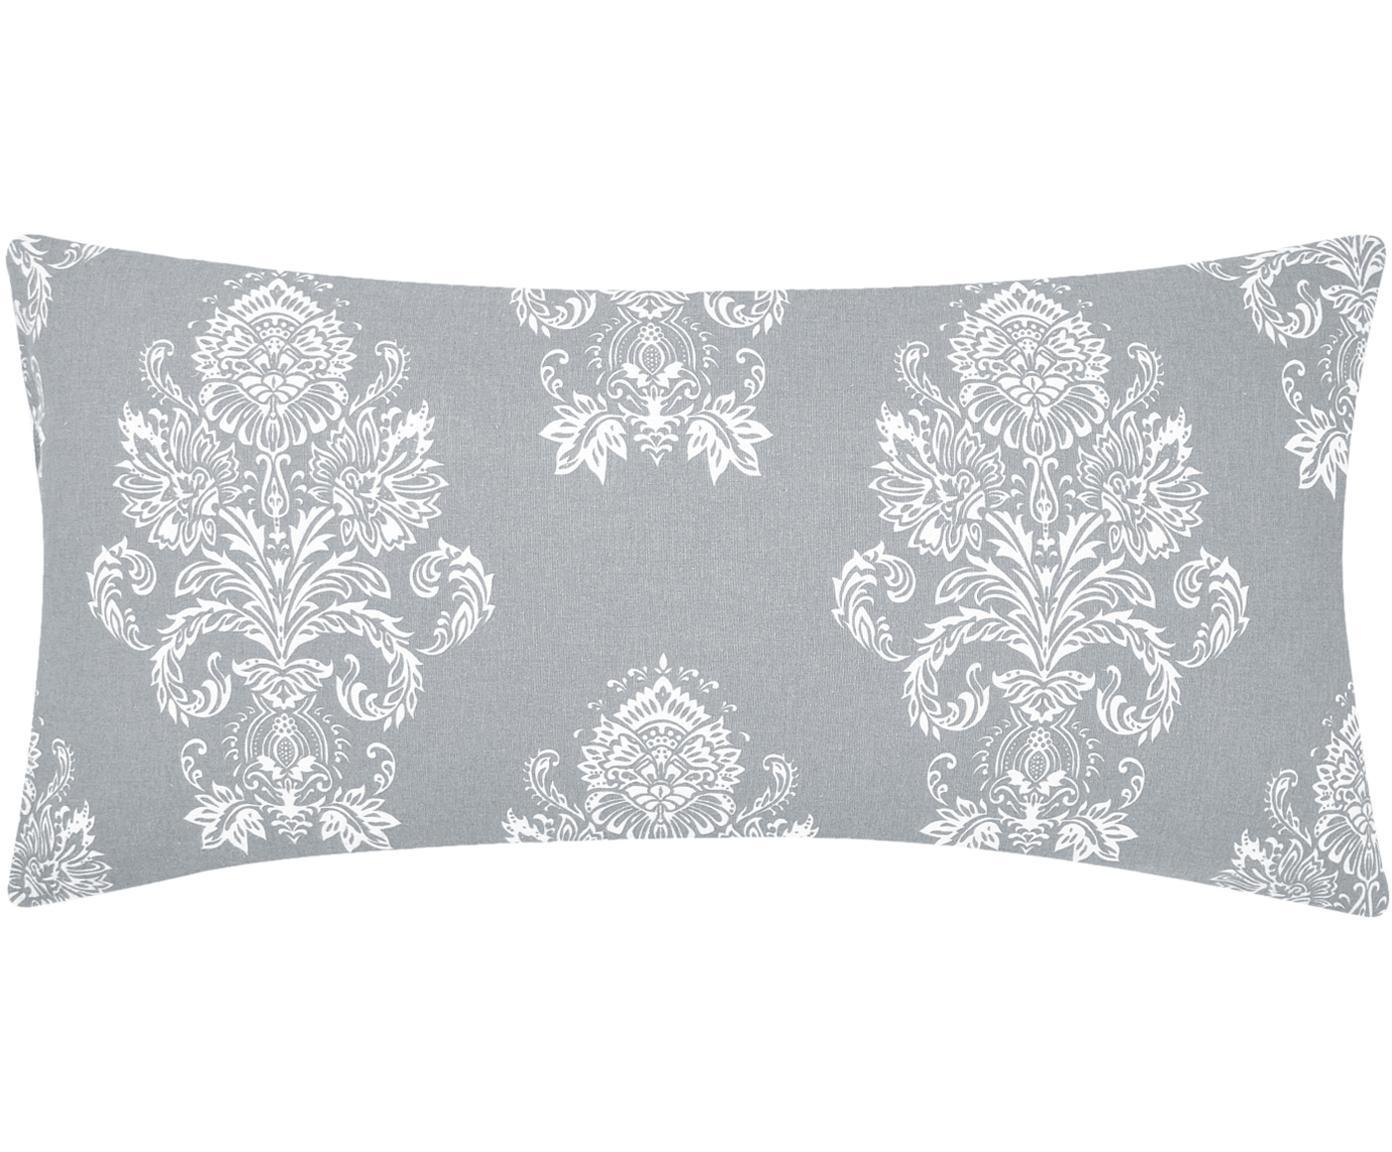 Flanell-Kissenbezüge Sissi, 2 Stück, Webart: Flanell Flanell ist ein s, Grau, Weiß, 40 x 80 cm